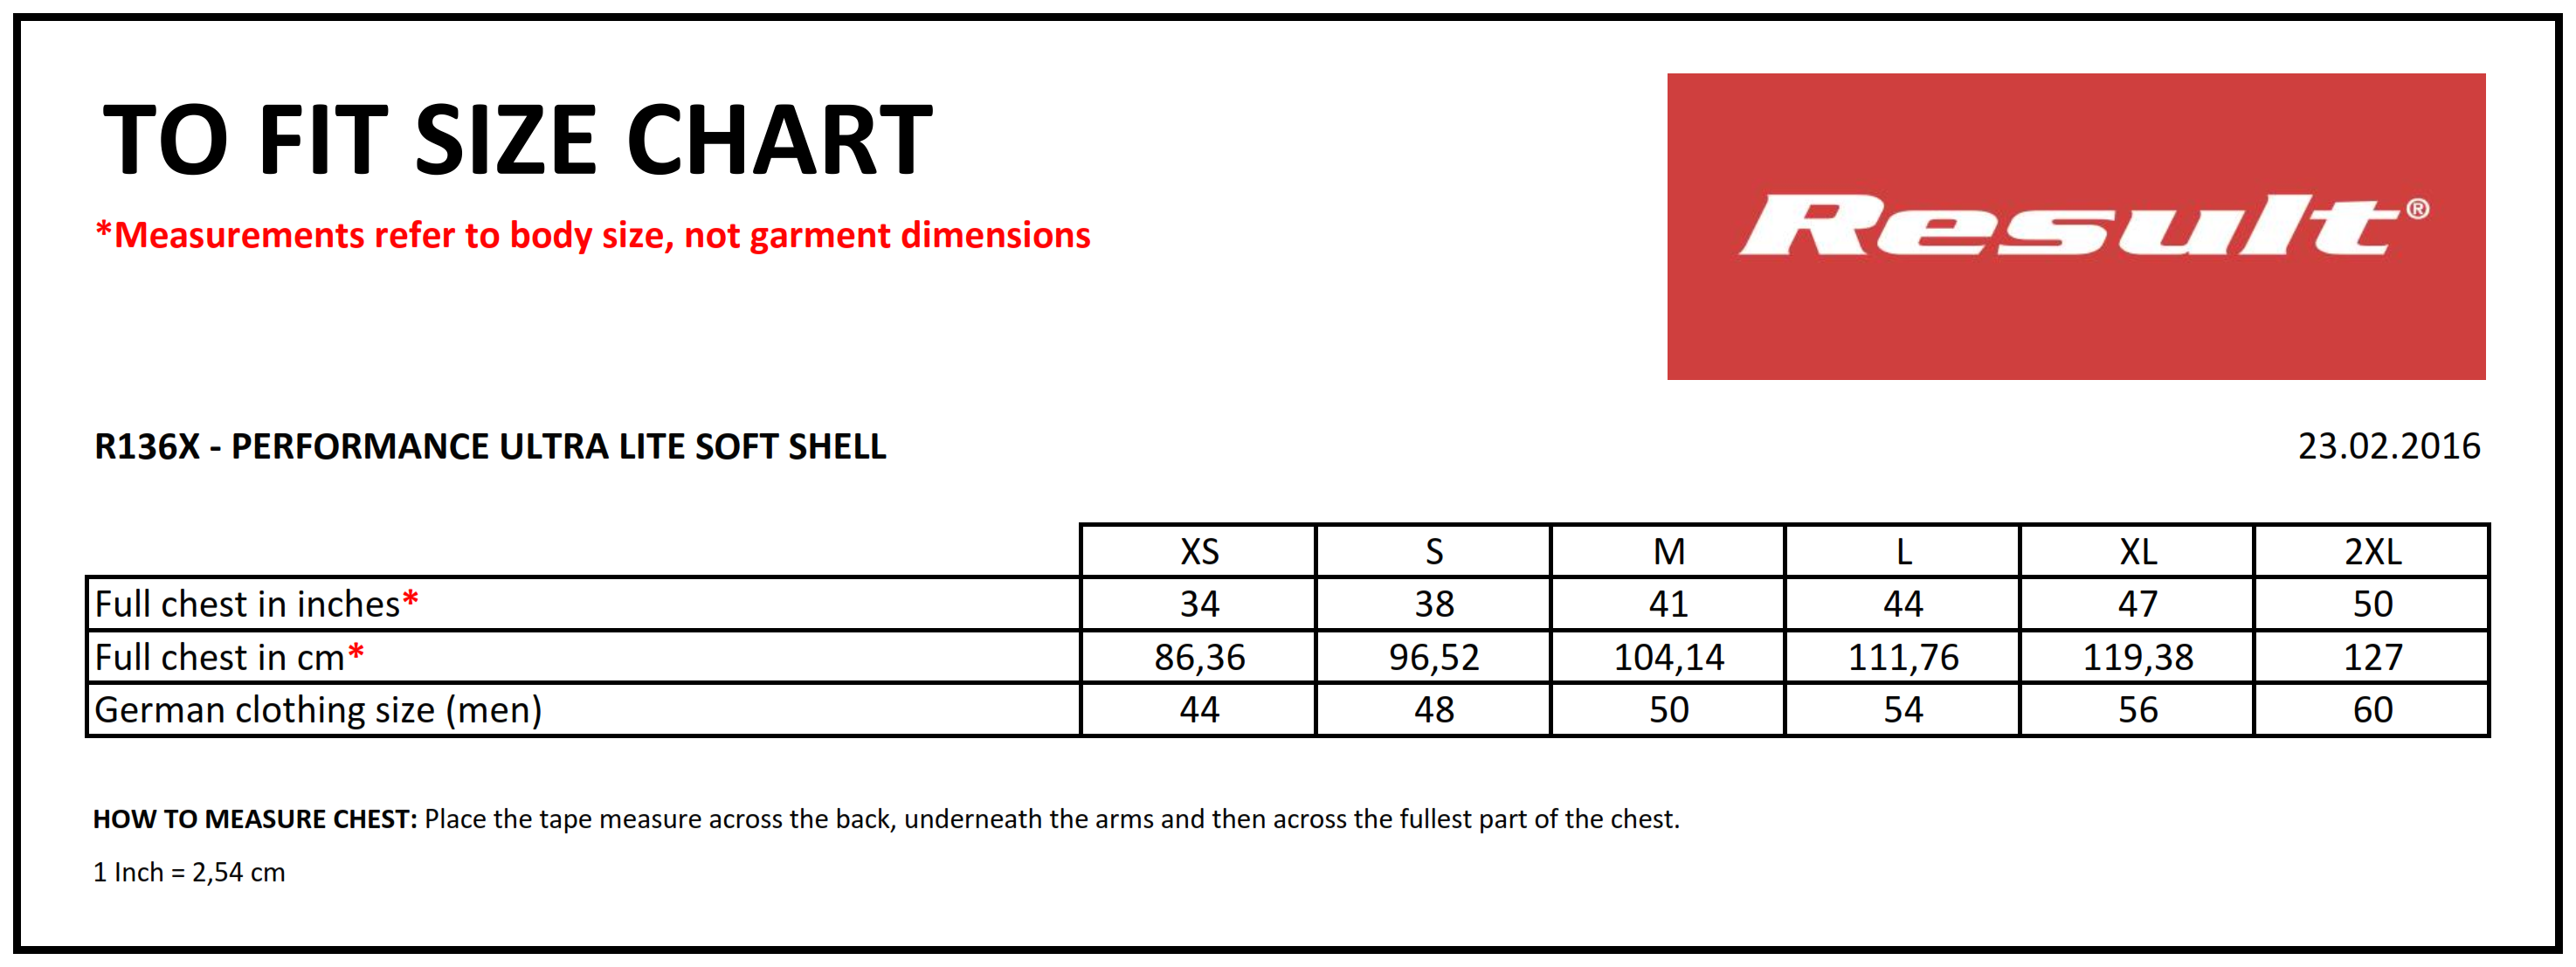 Result: Performance Ultra Lite Soft Shell R136X